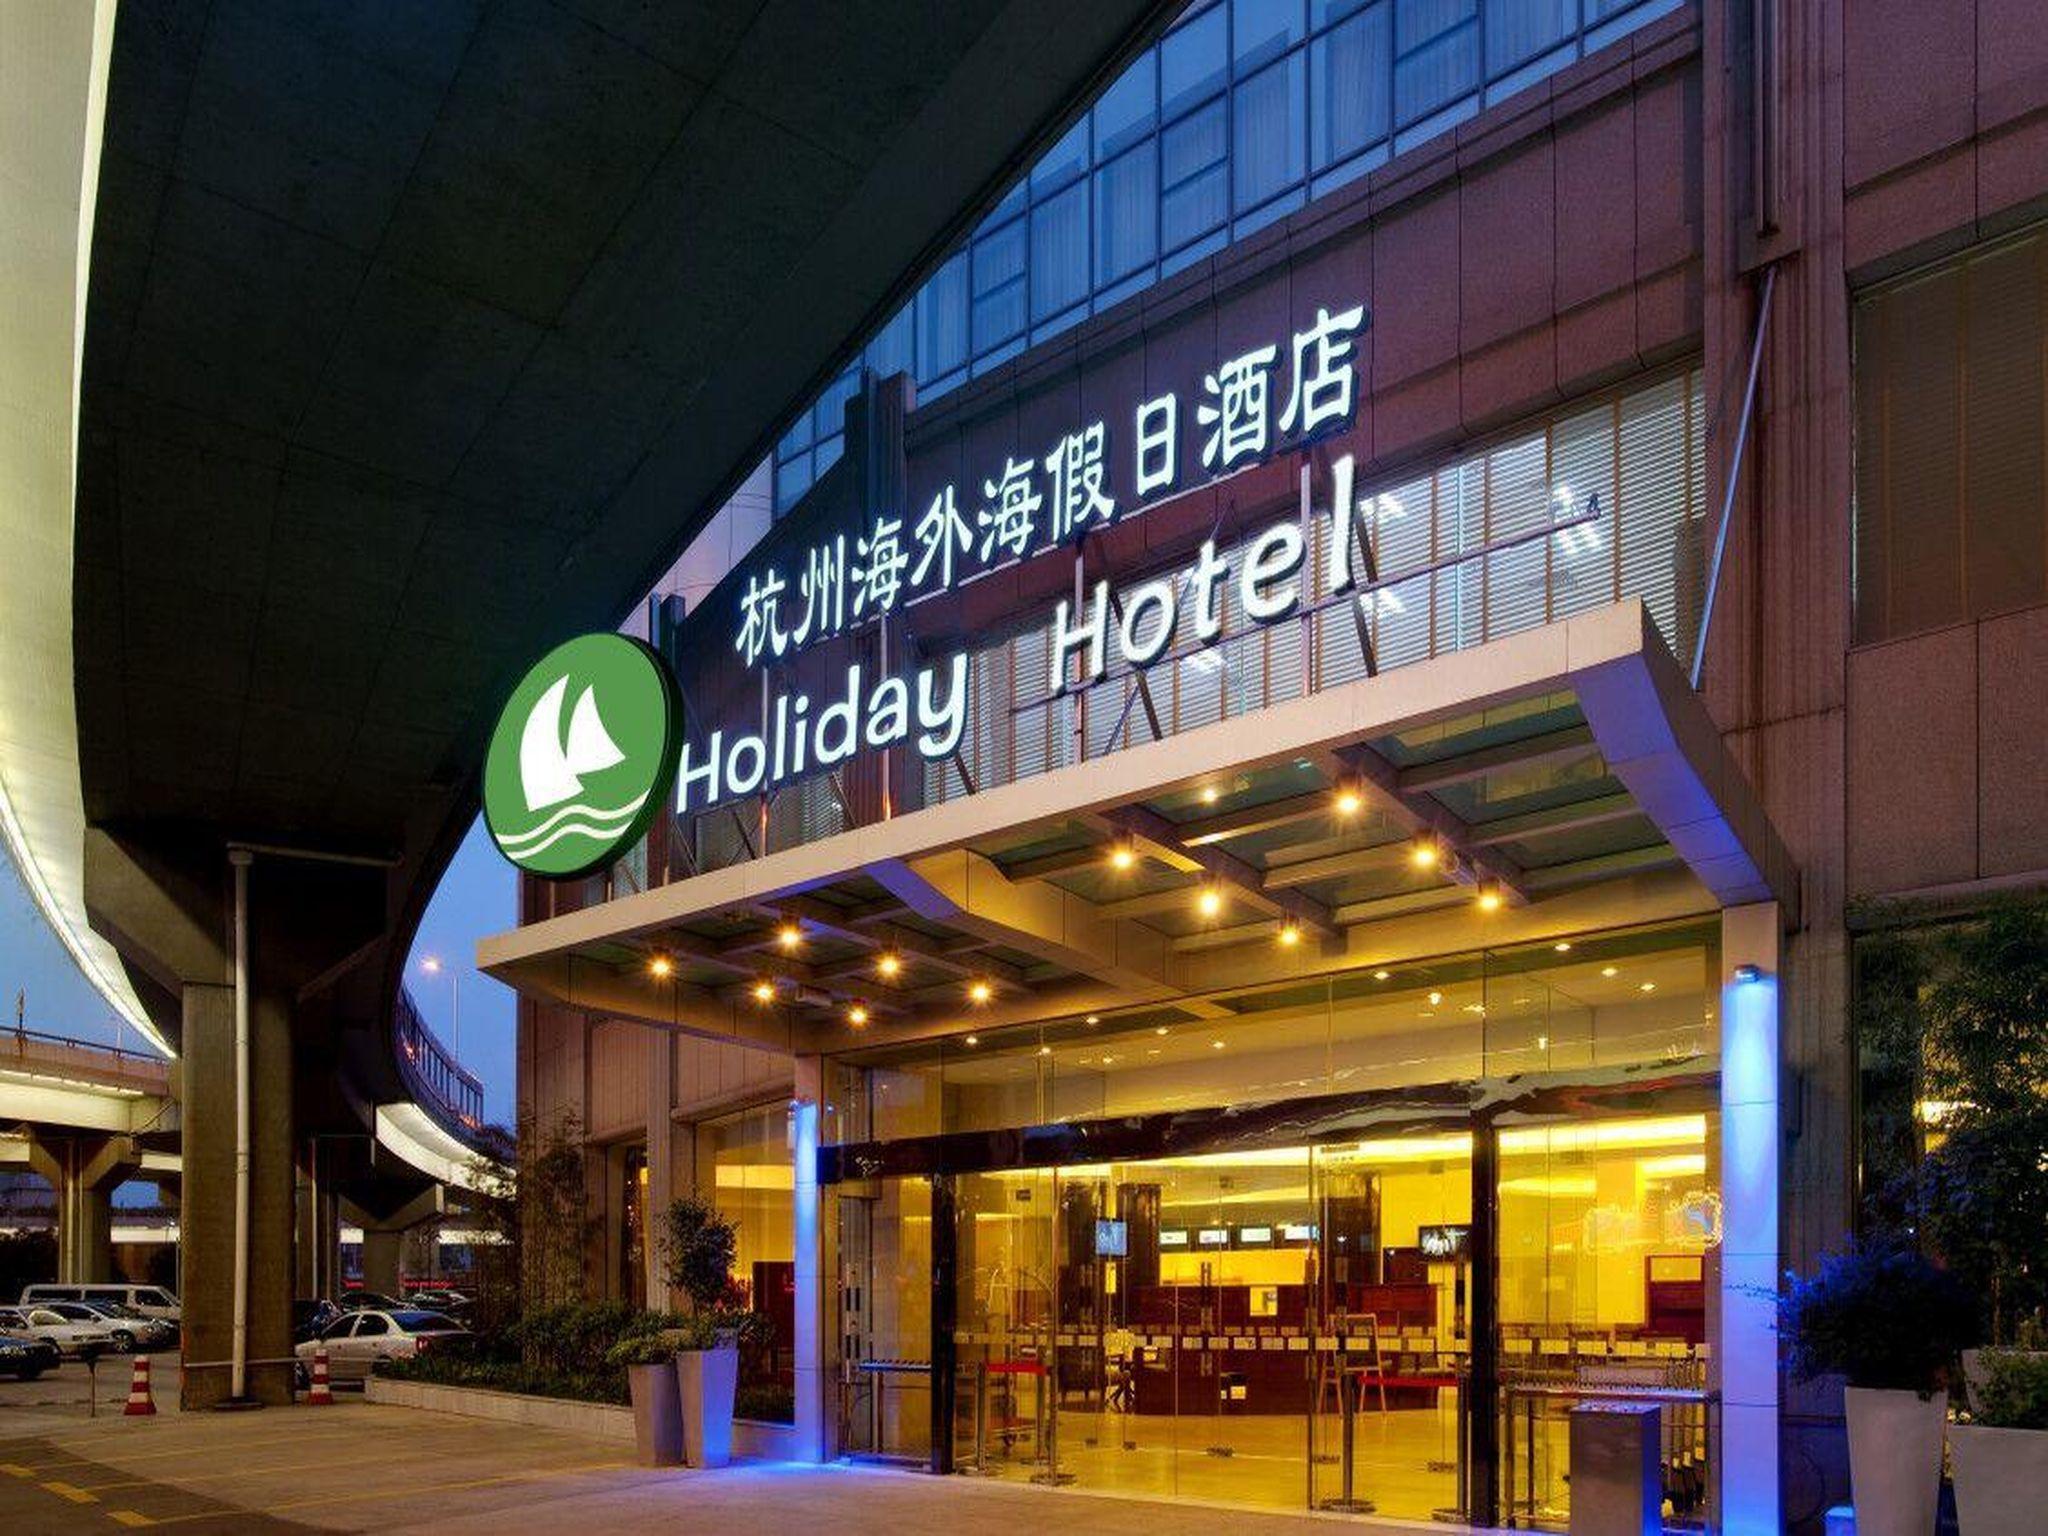 Holiday Inn Express Hangzhou Grand Canal Booking Agoda Com